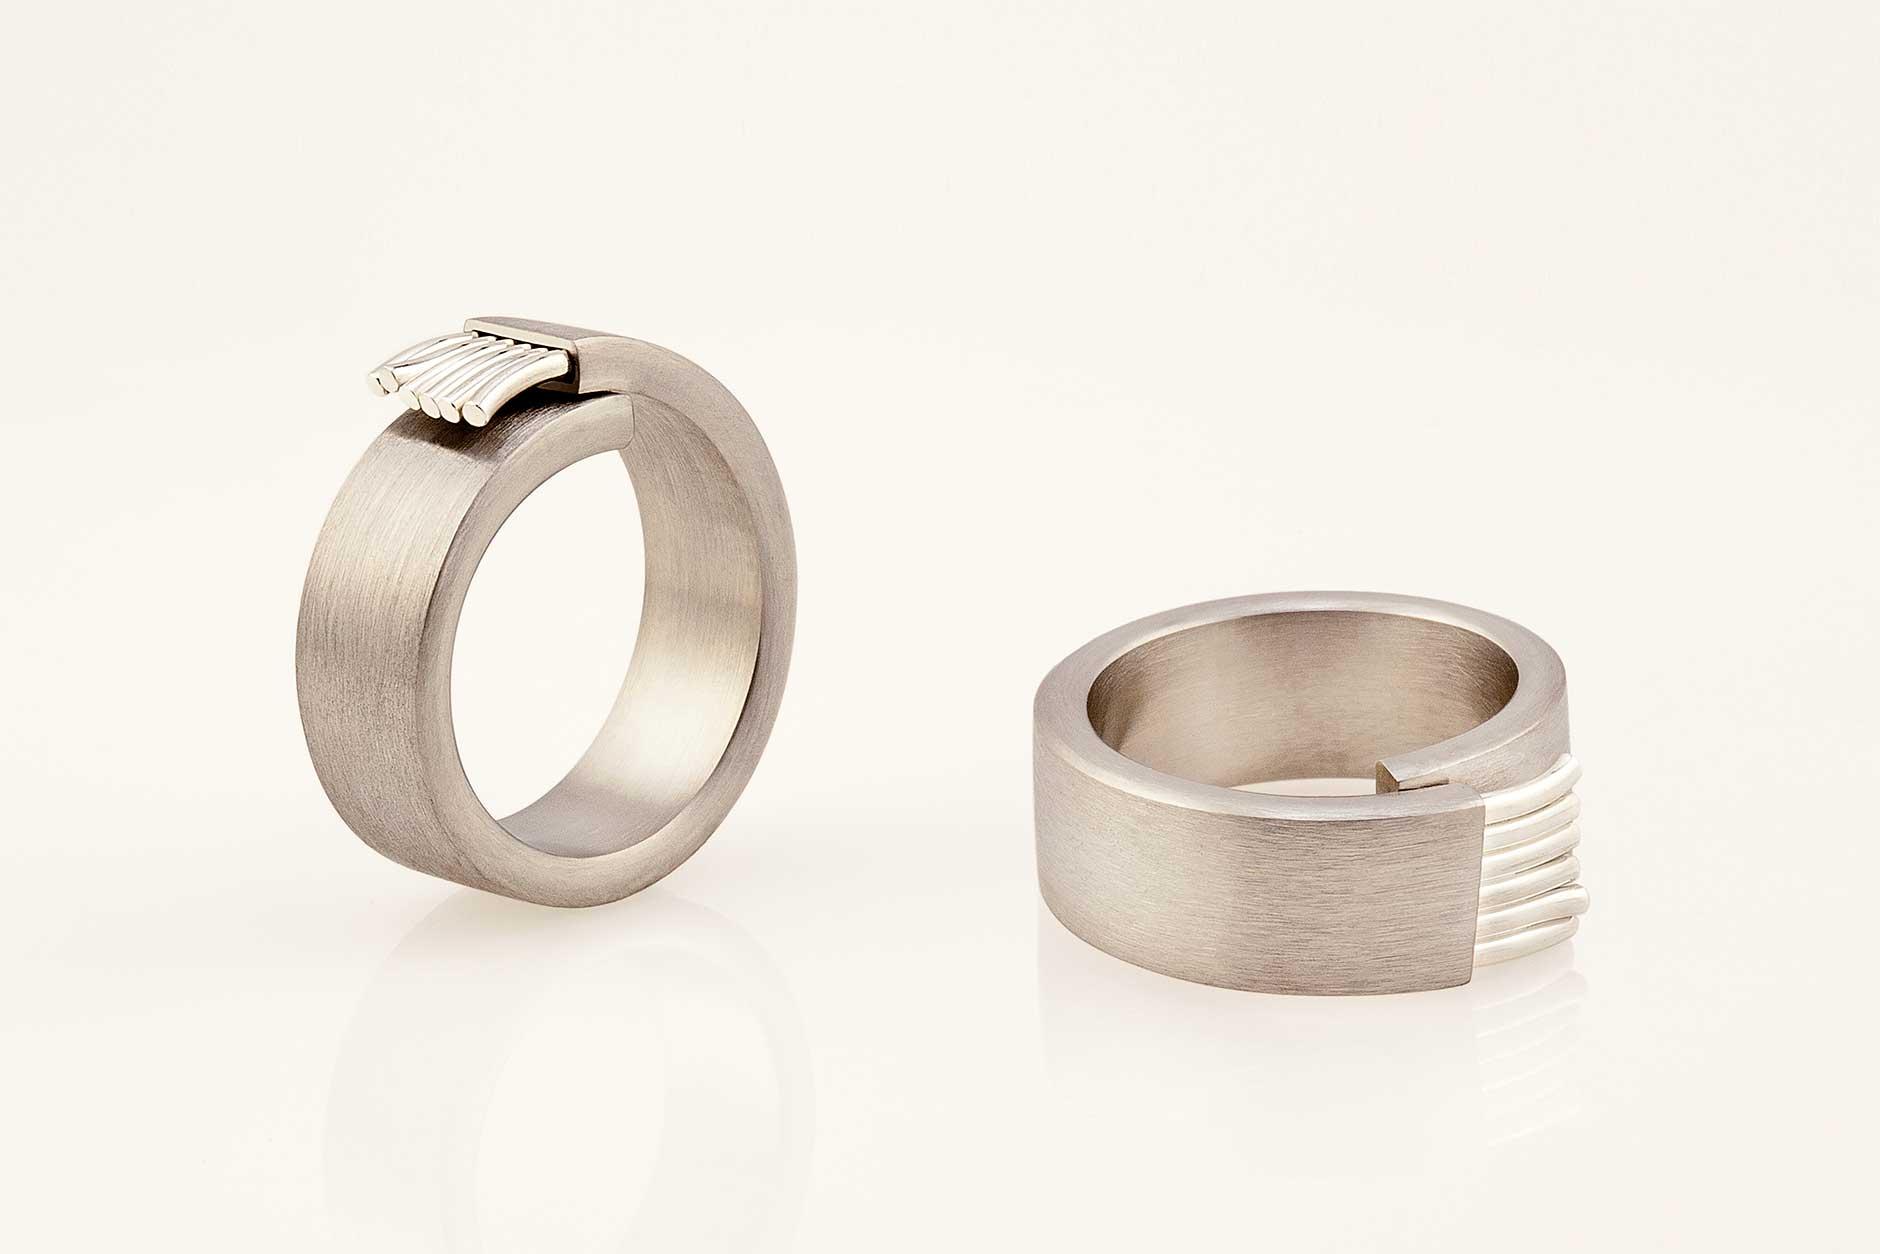 Fiber handmade silver and 19k white gold ring - NEWA Goldsmith